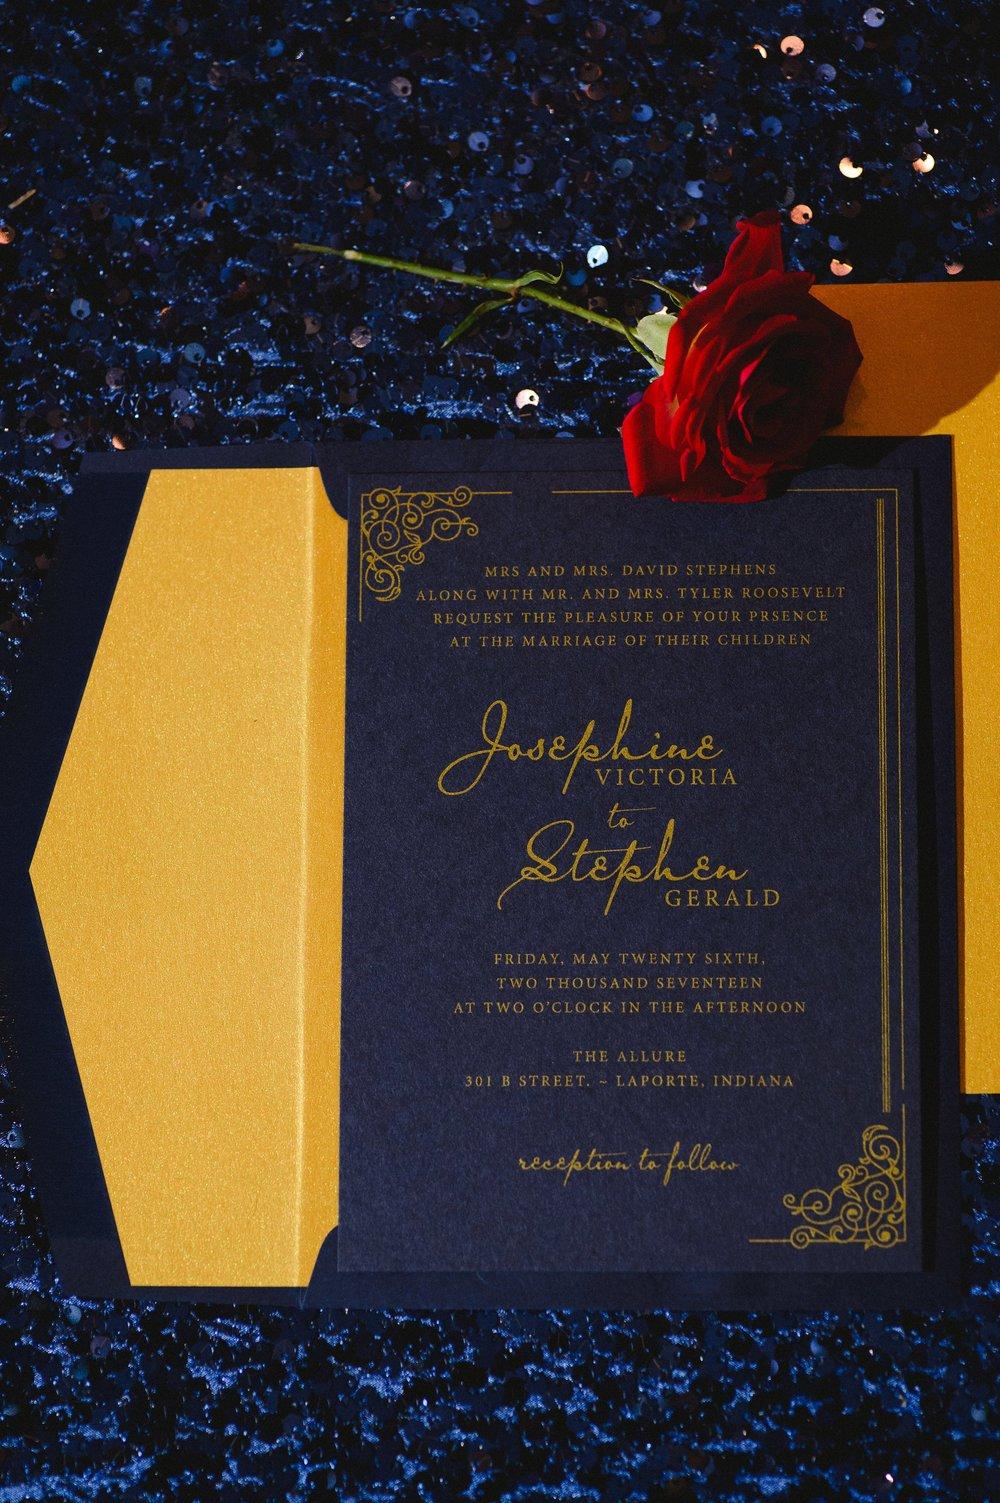 KatherineMurrayPhotography_StyledShoot_Wedding_BeautyAndTheBeast_ATaleAsOldAsTime_theAllure_LaPorteIndiana00248-min.jpg